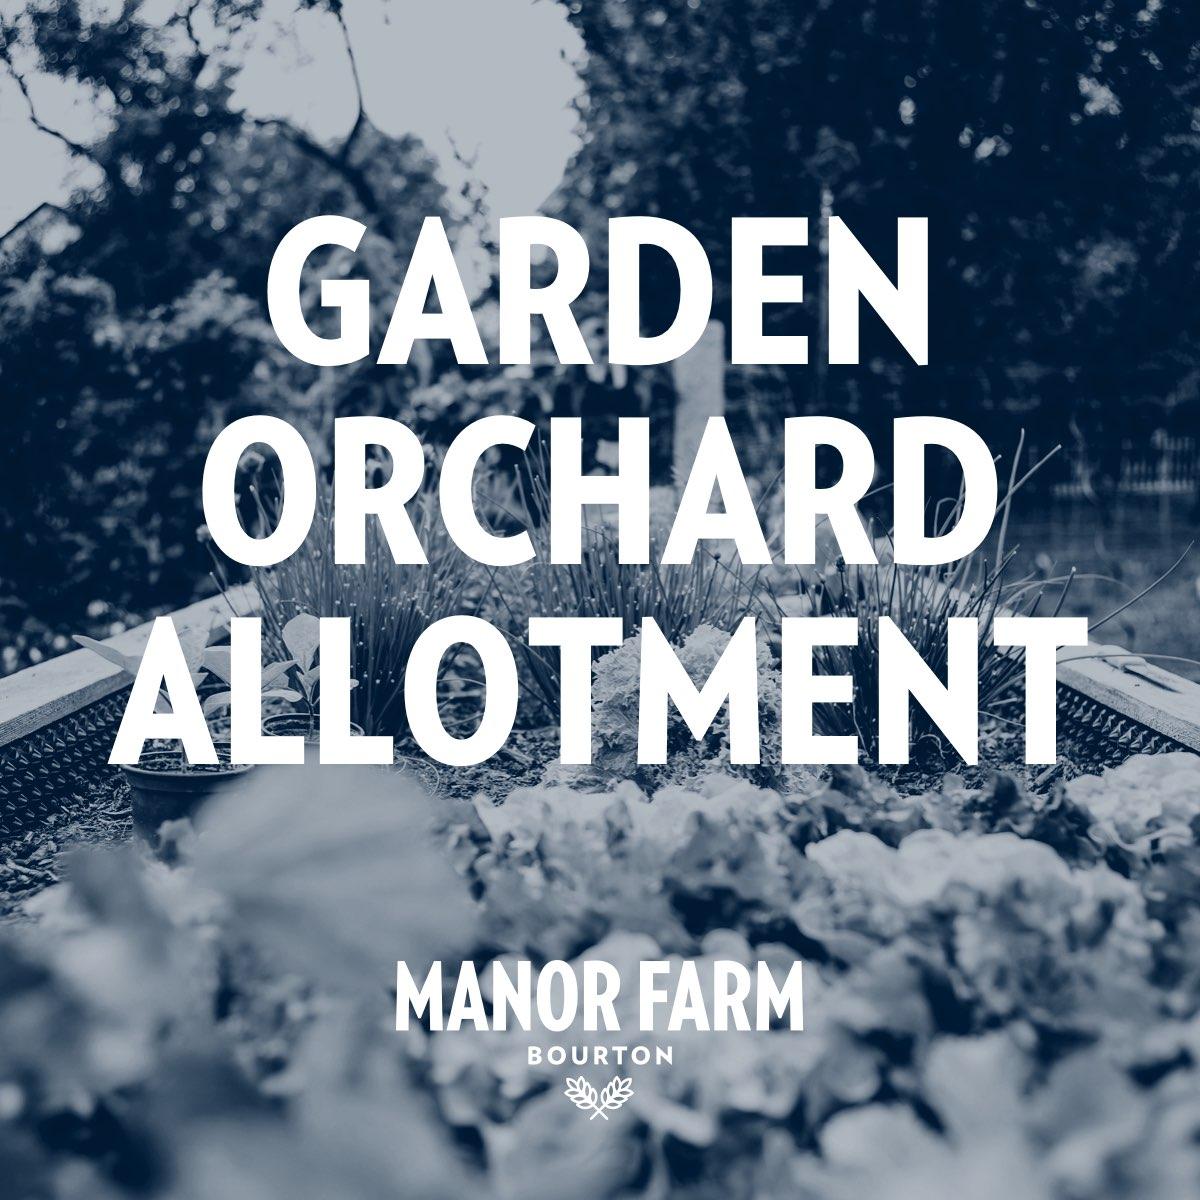 Garden Orchard Allotment